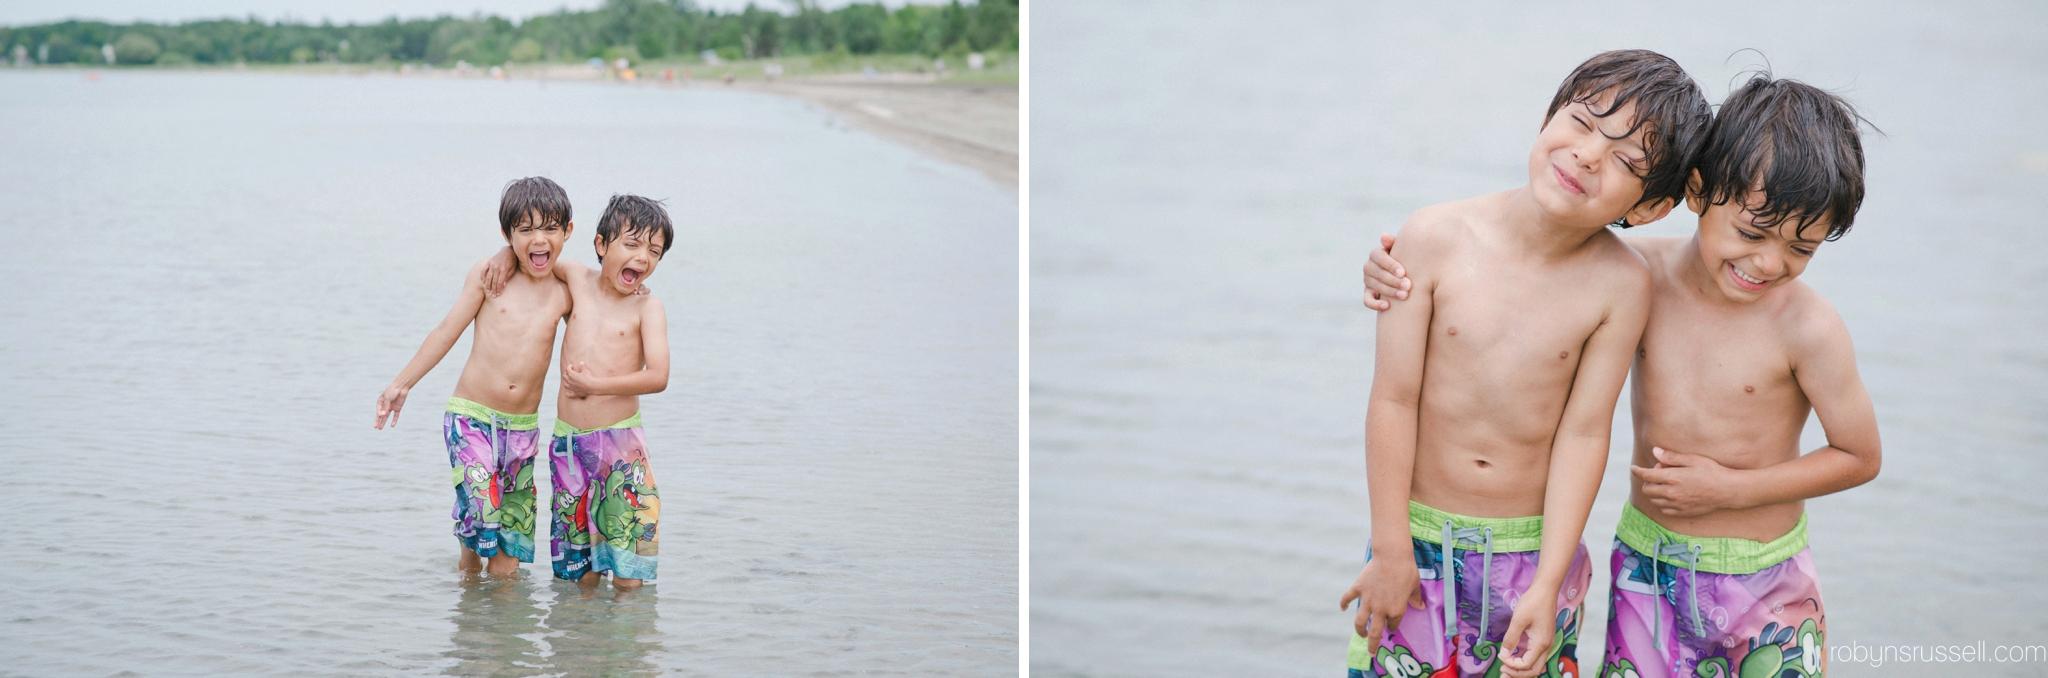 08-twin-boys-laughing-beach-portrait.jpg